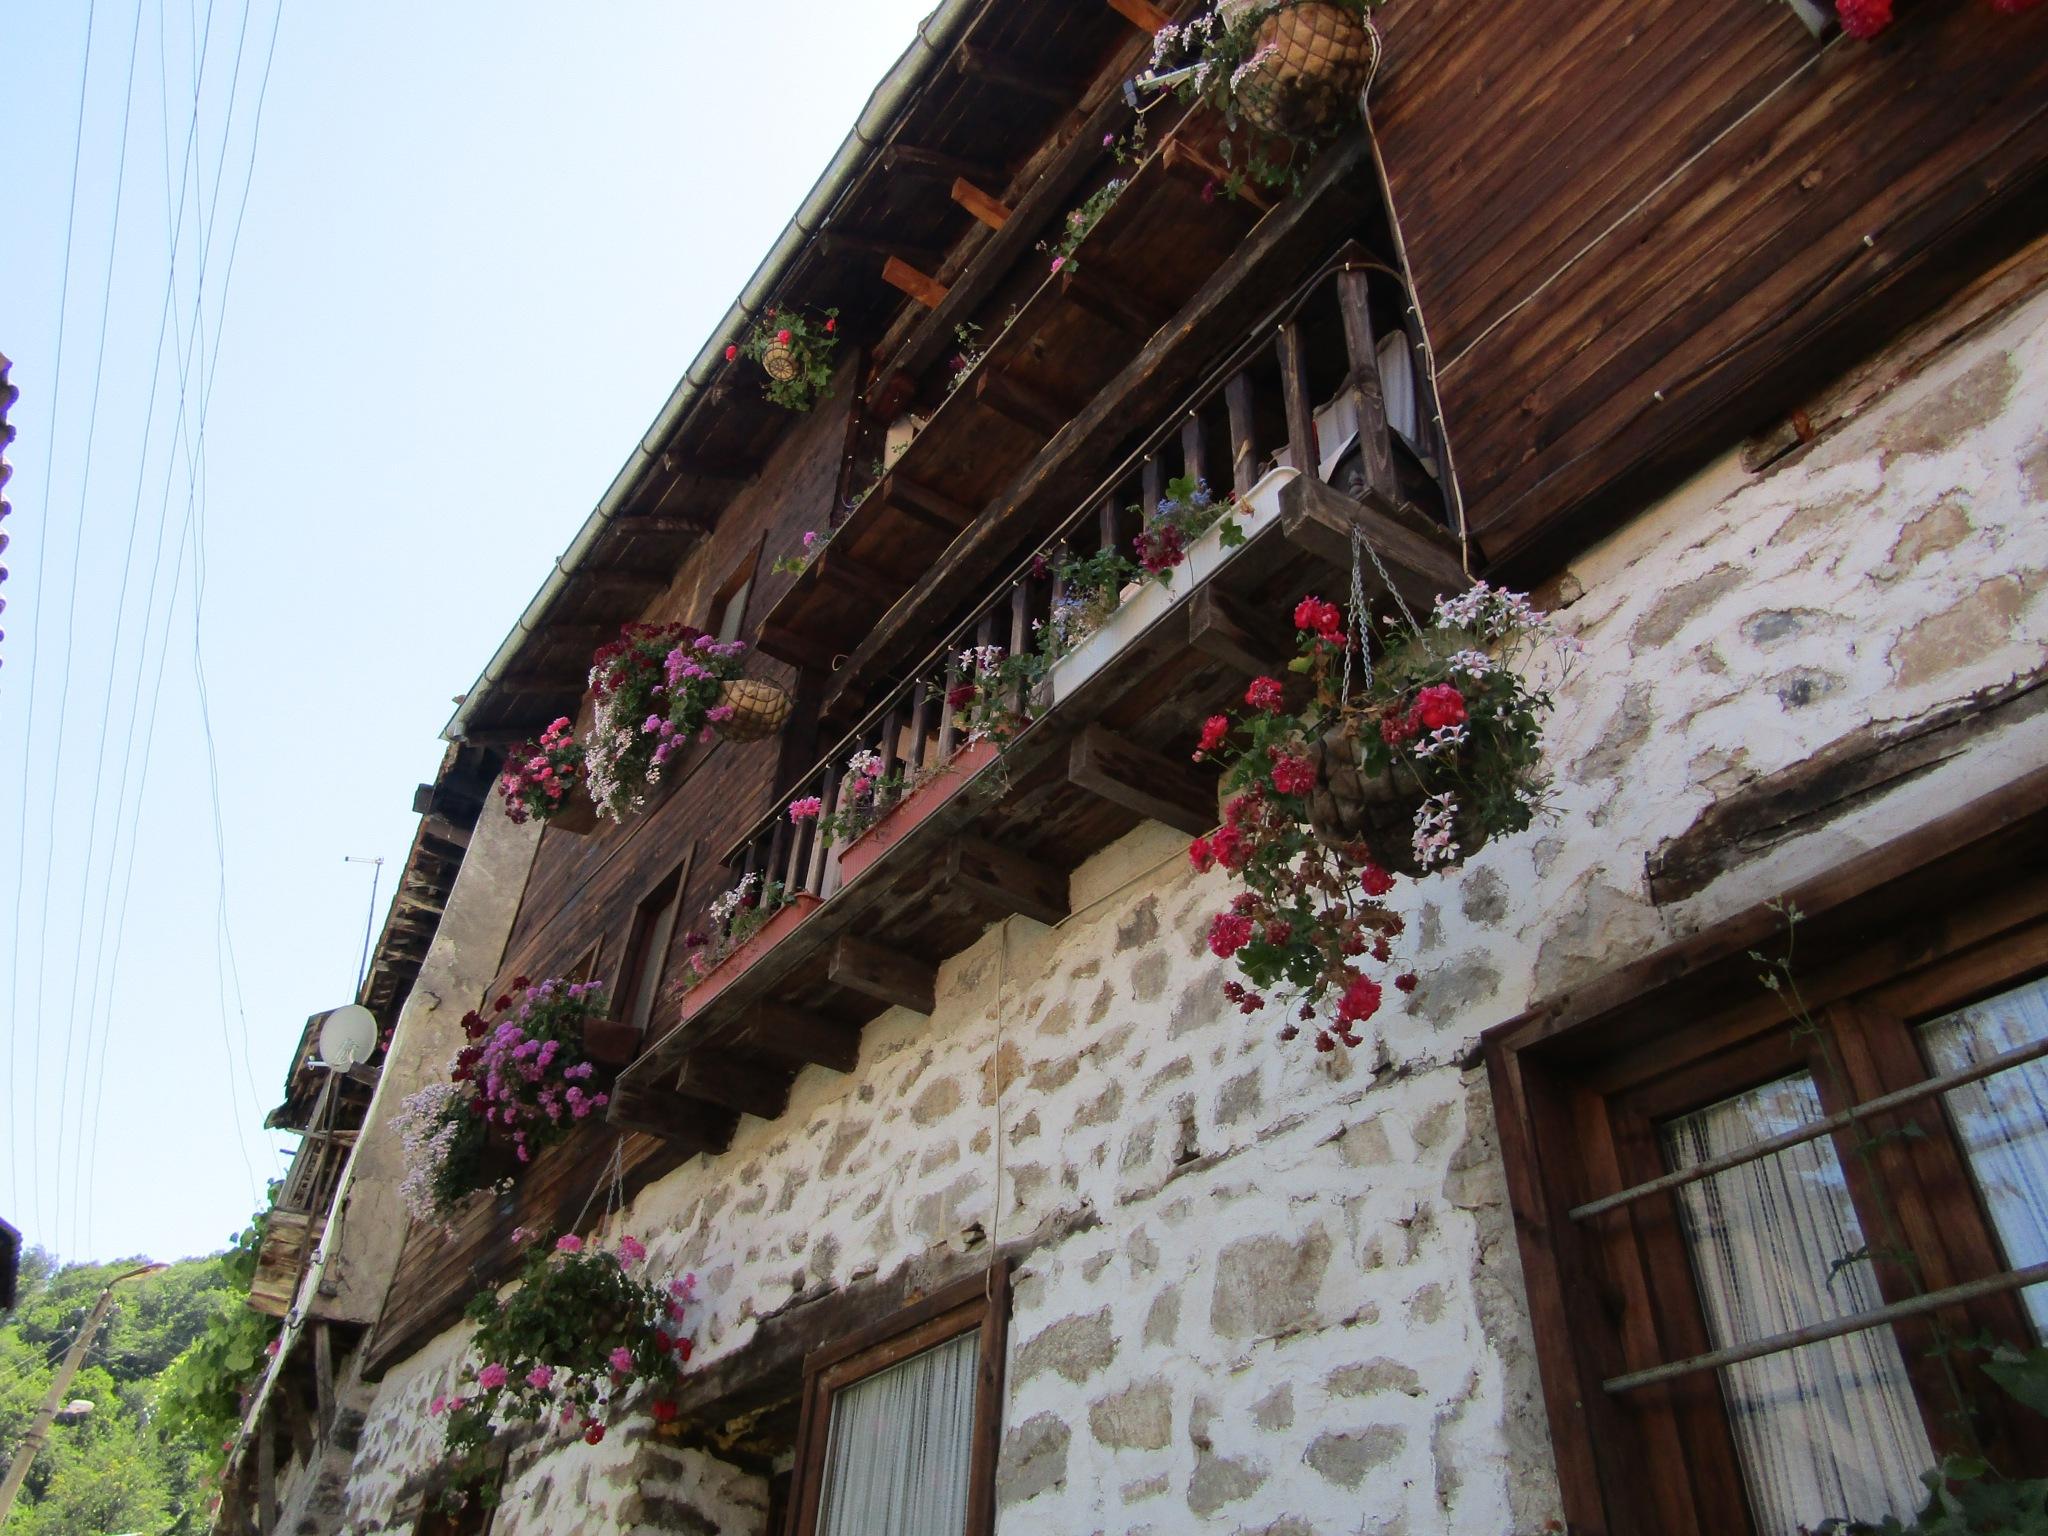 Old bulgarian house by Hari62